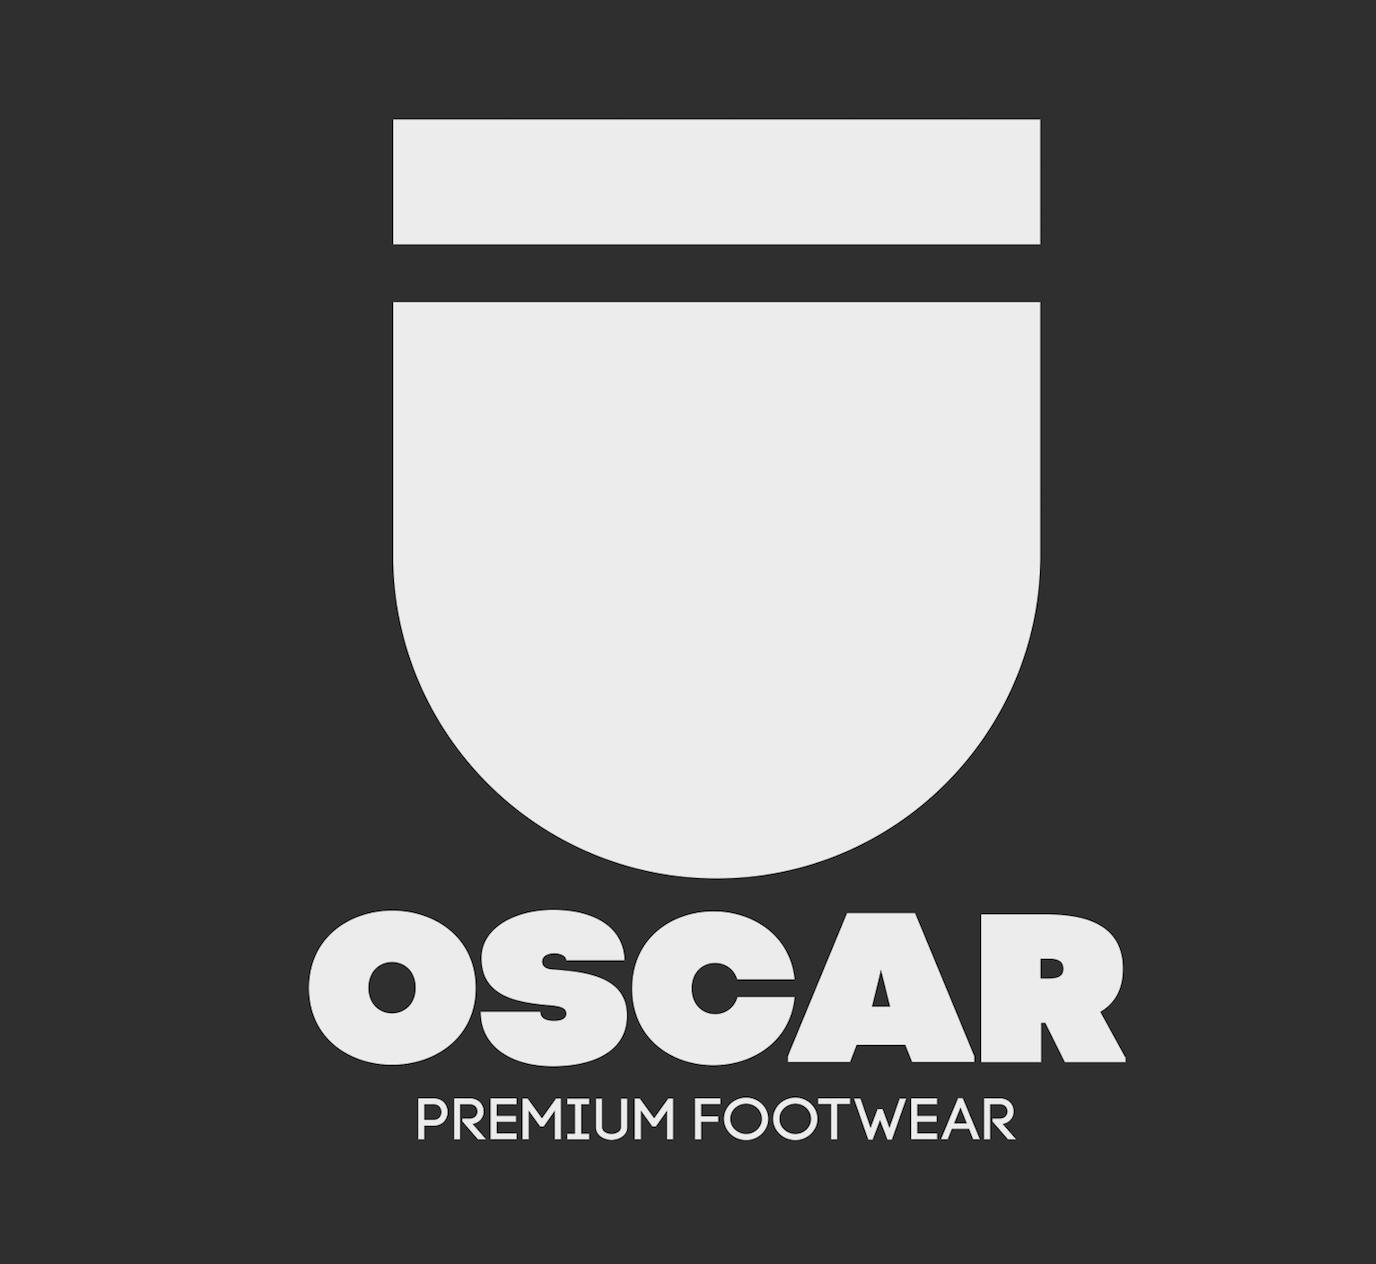 oscar_logo